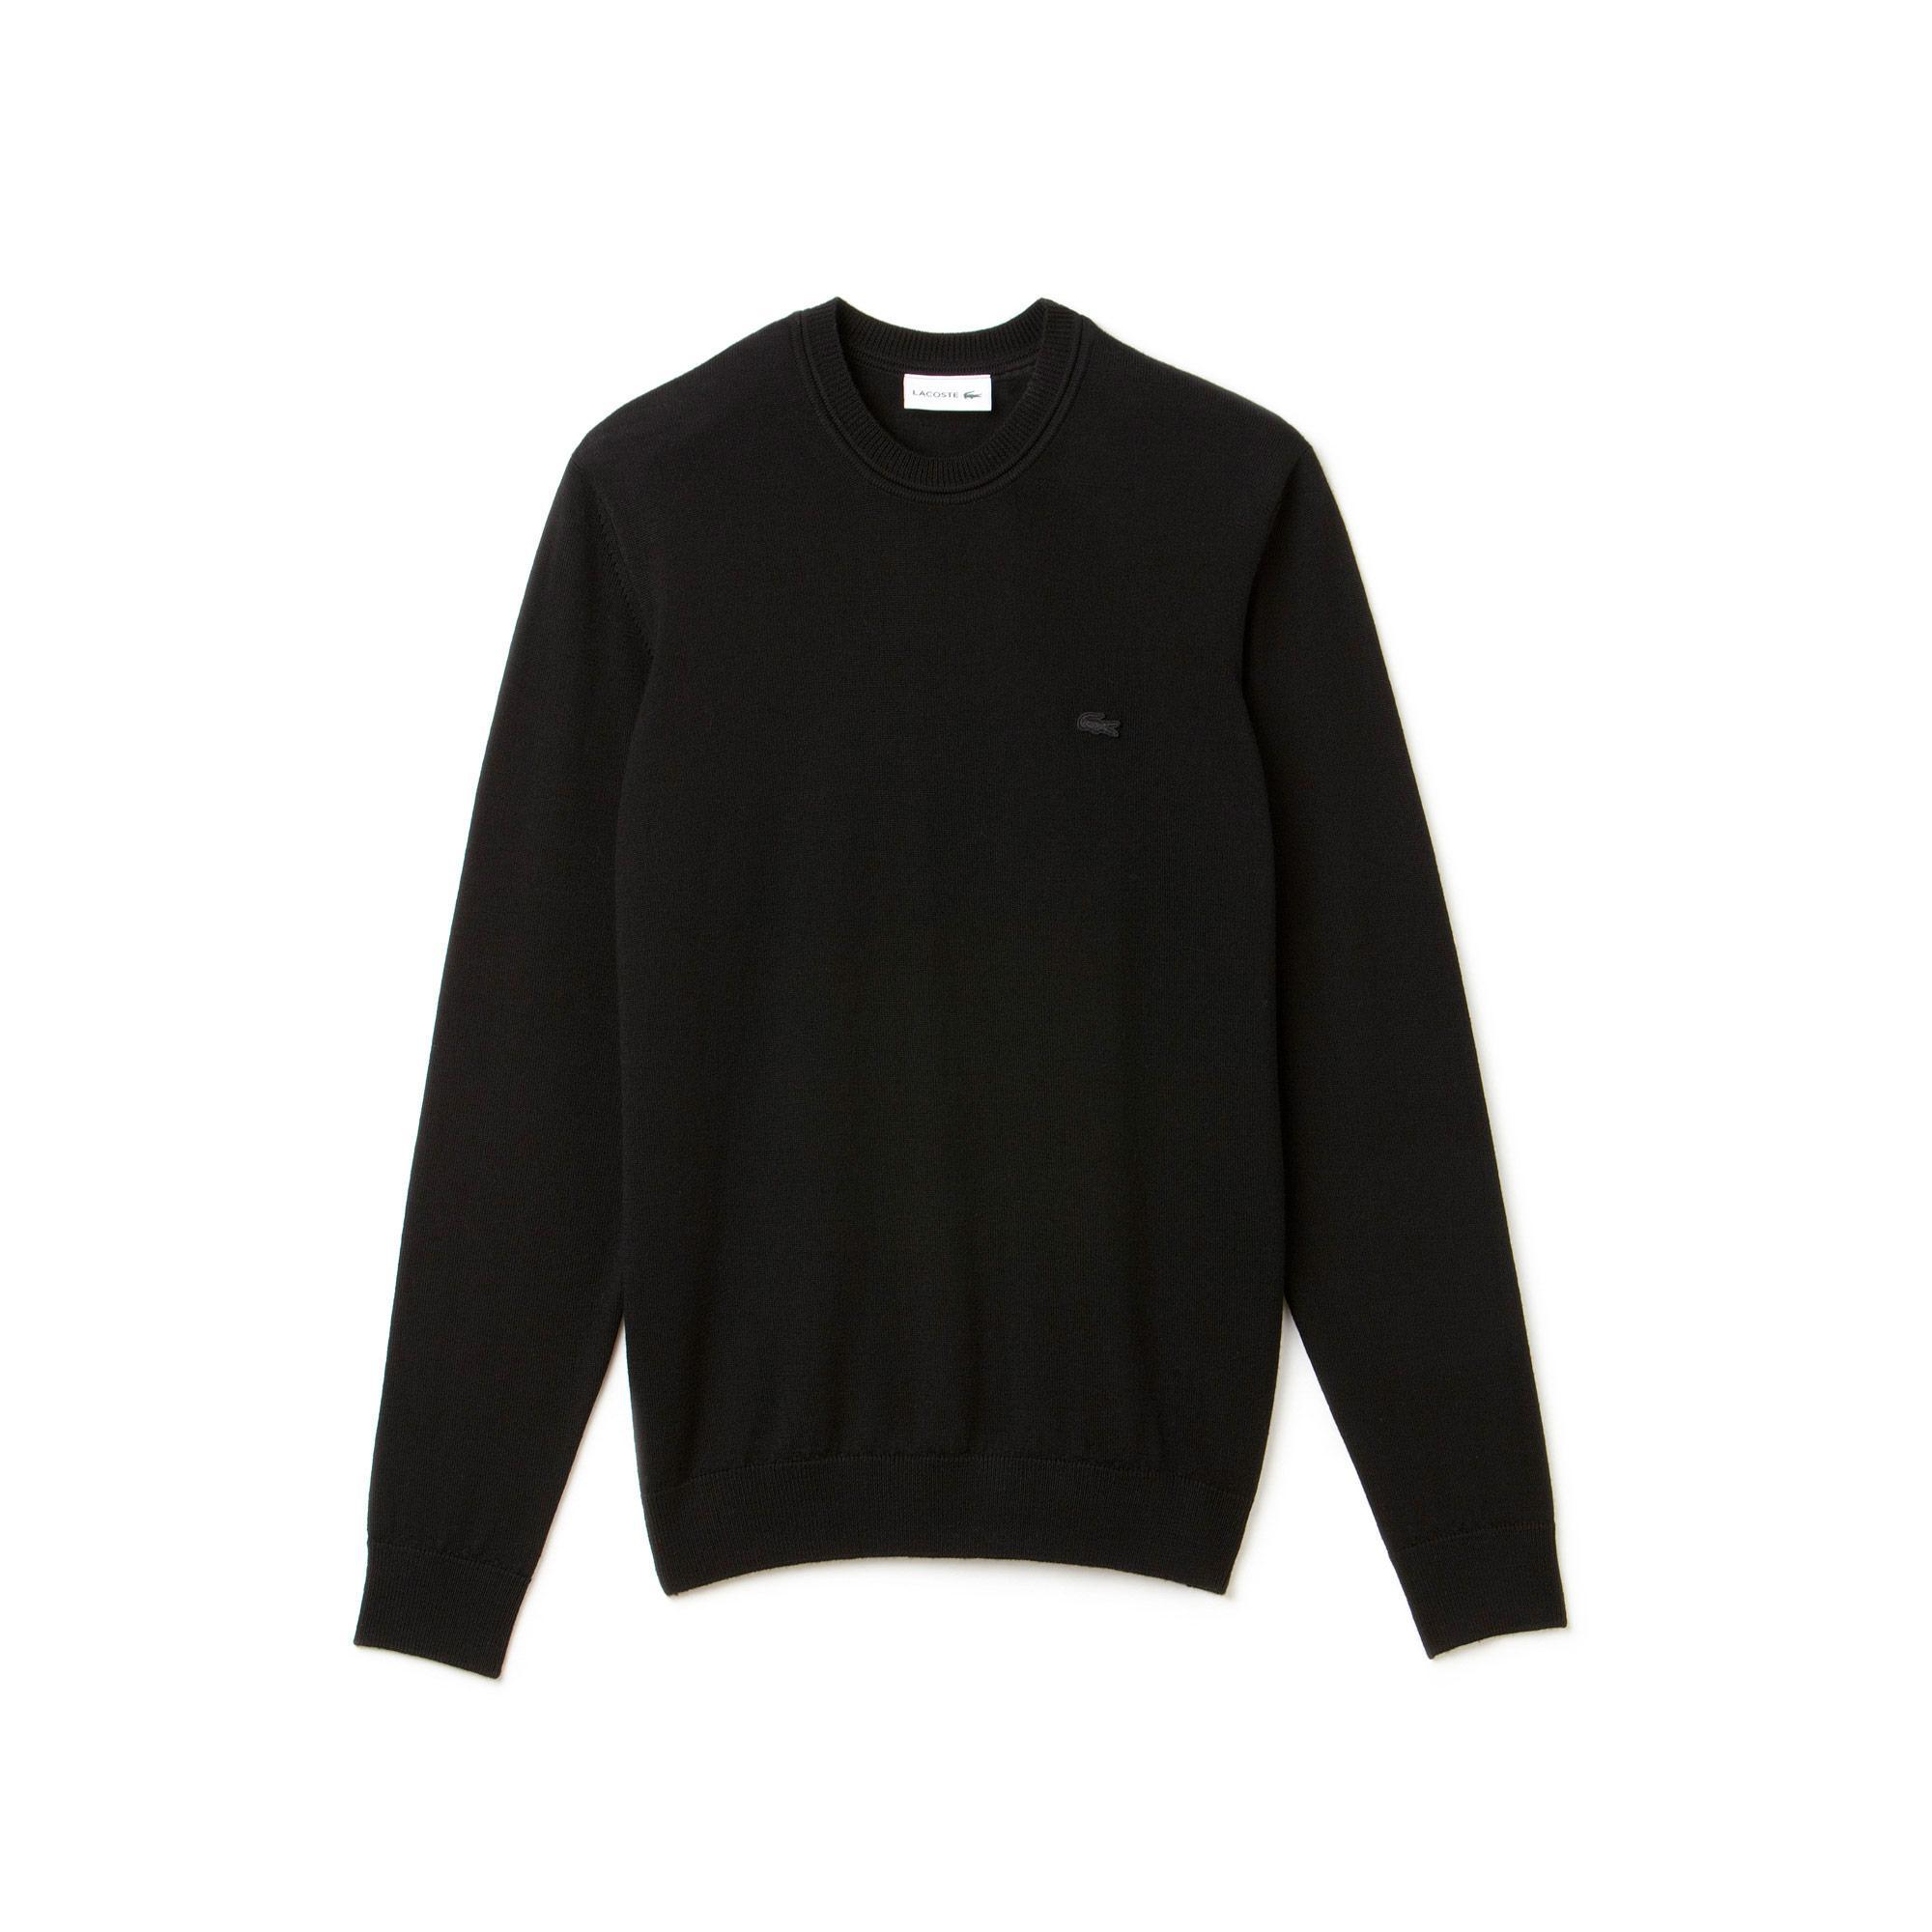 Lacoste Men's Crew Neck Wool Jersey Sweater